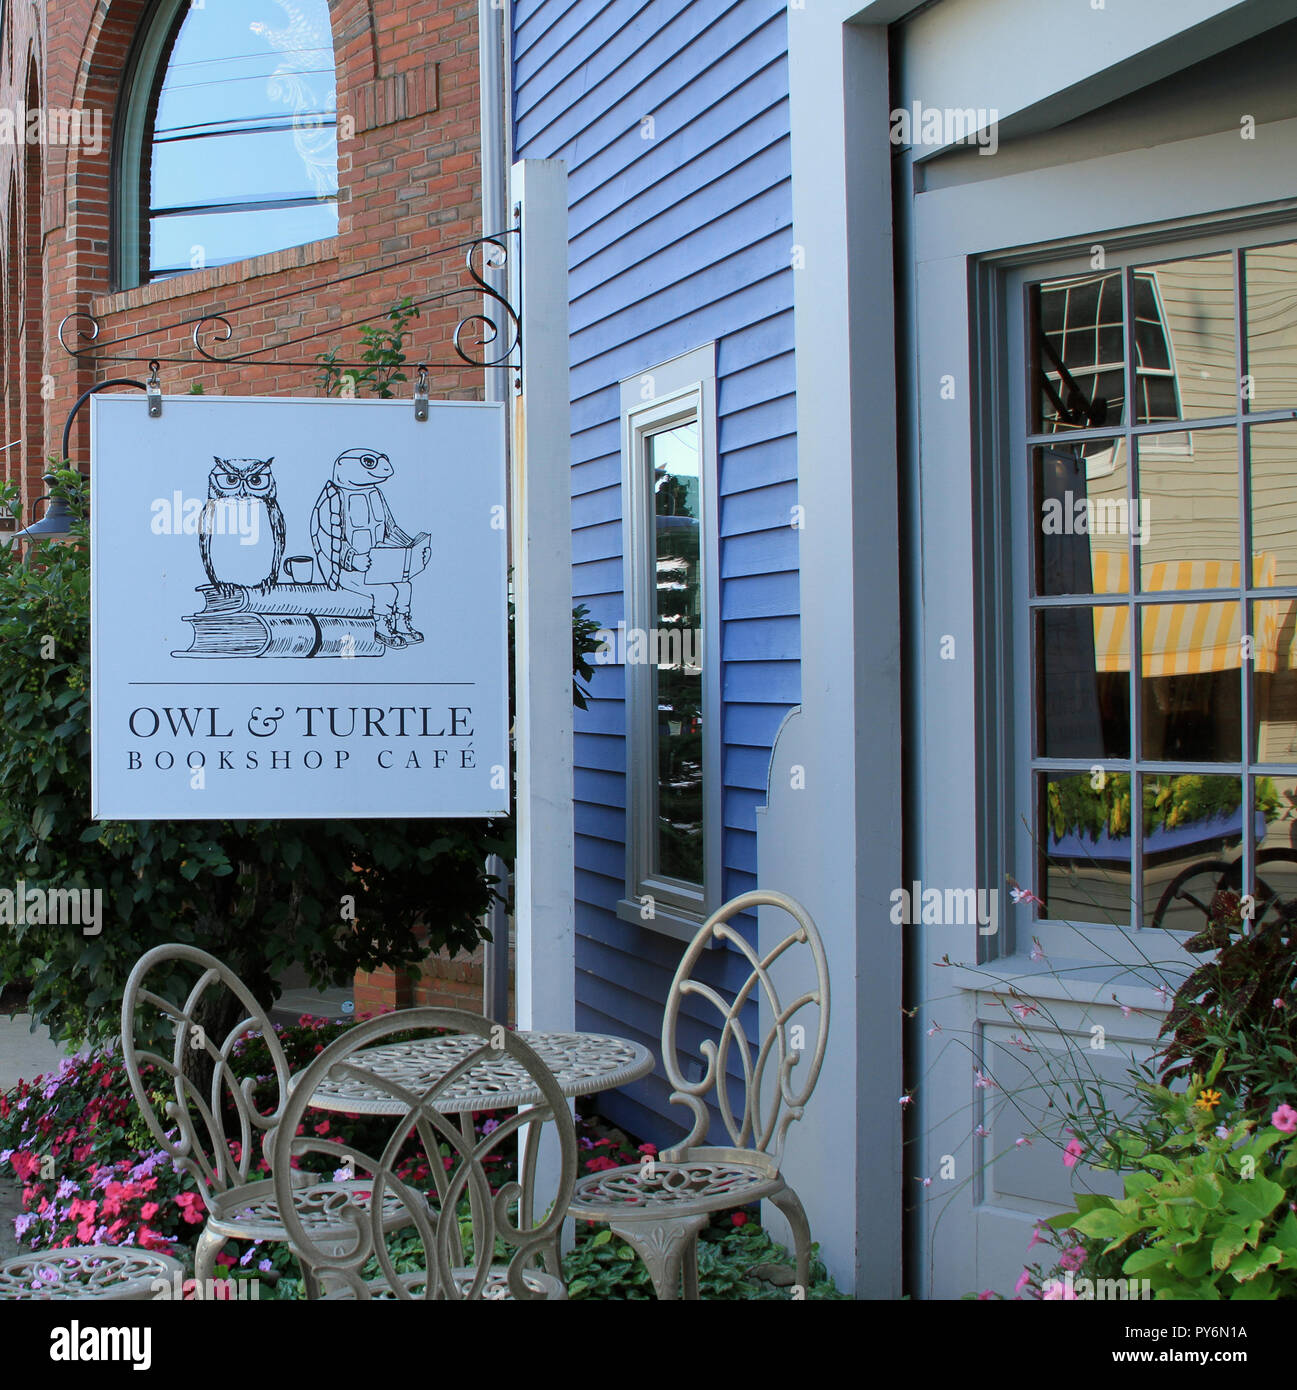 The Owl & Turtle Bookshop Cafe, Camden, Maine Stock Photo